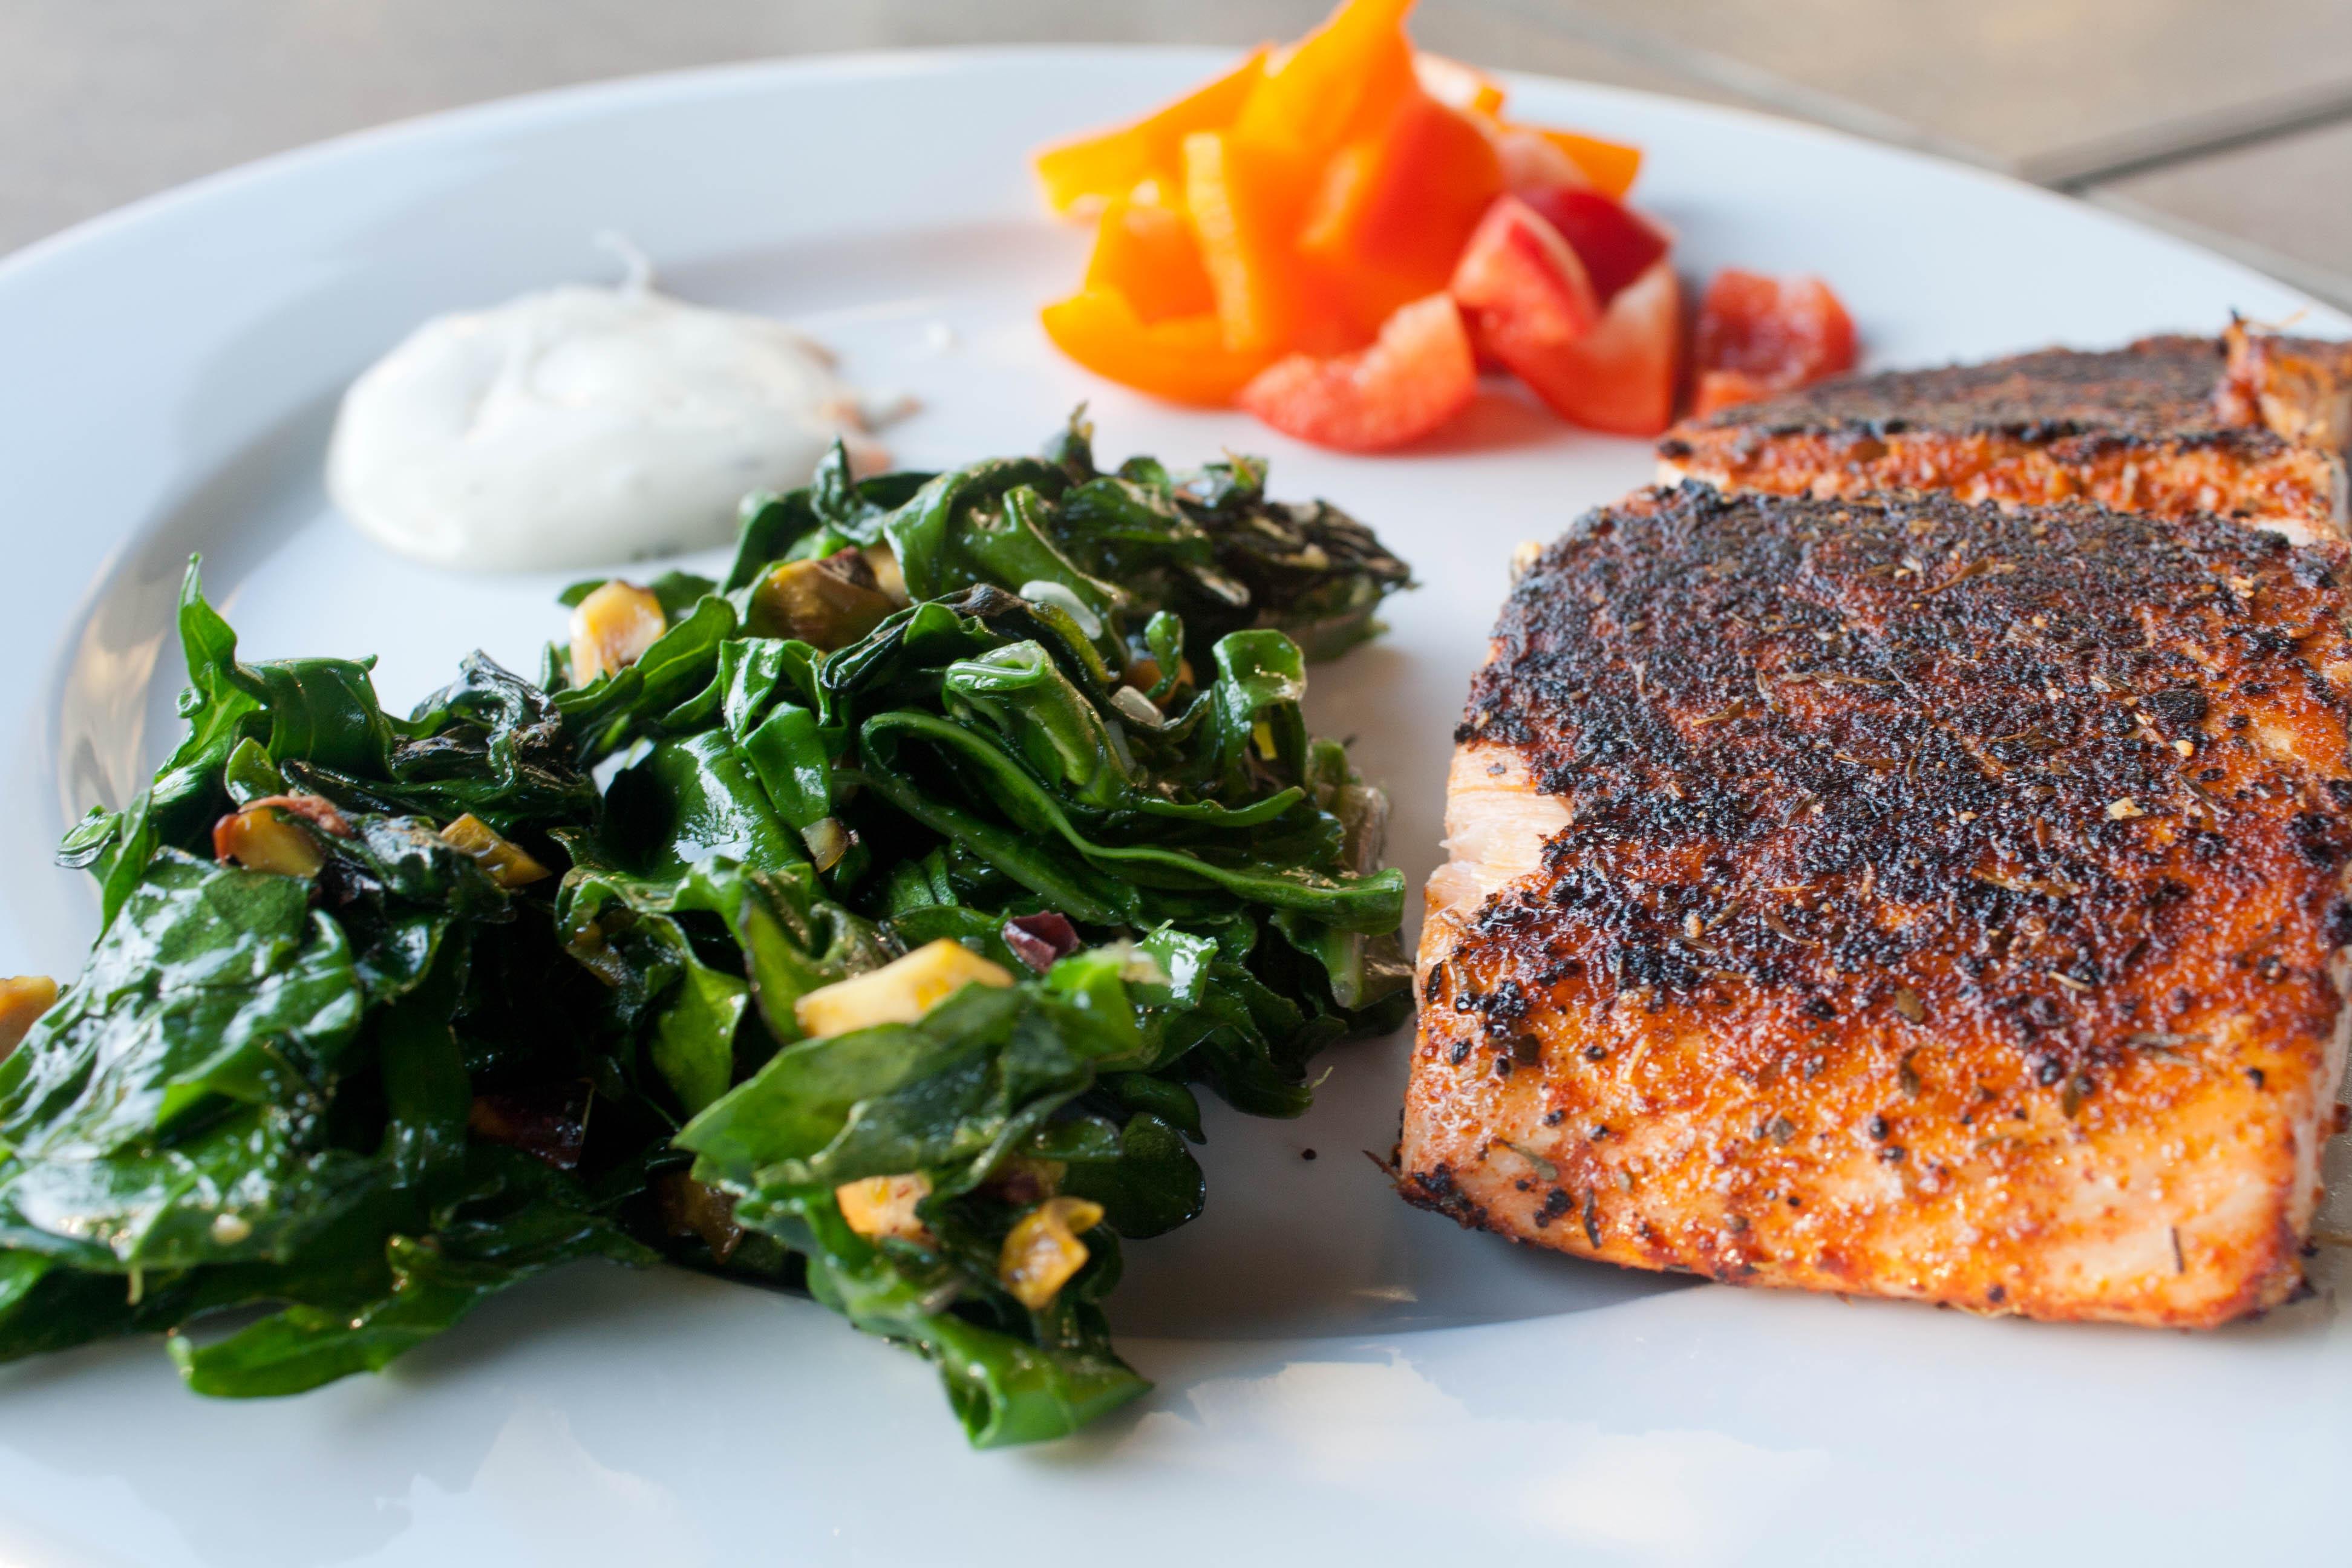 Sautéed Kale with Smoked Paprika Recipe